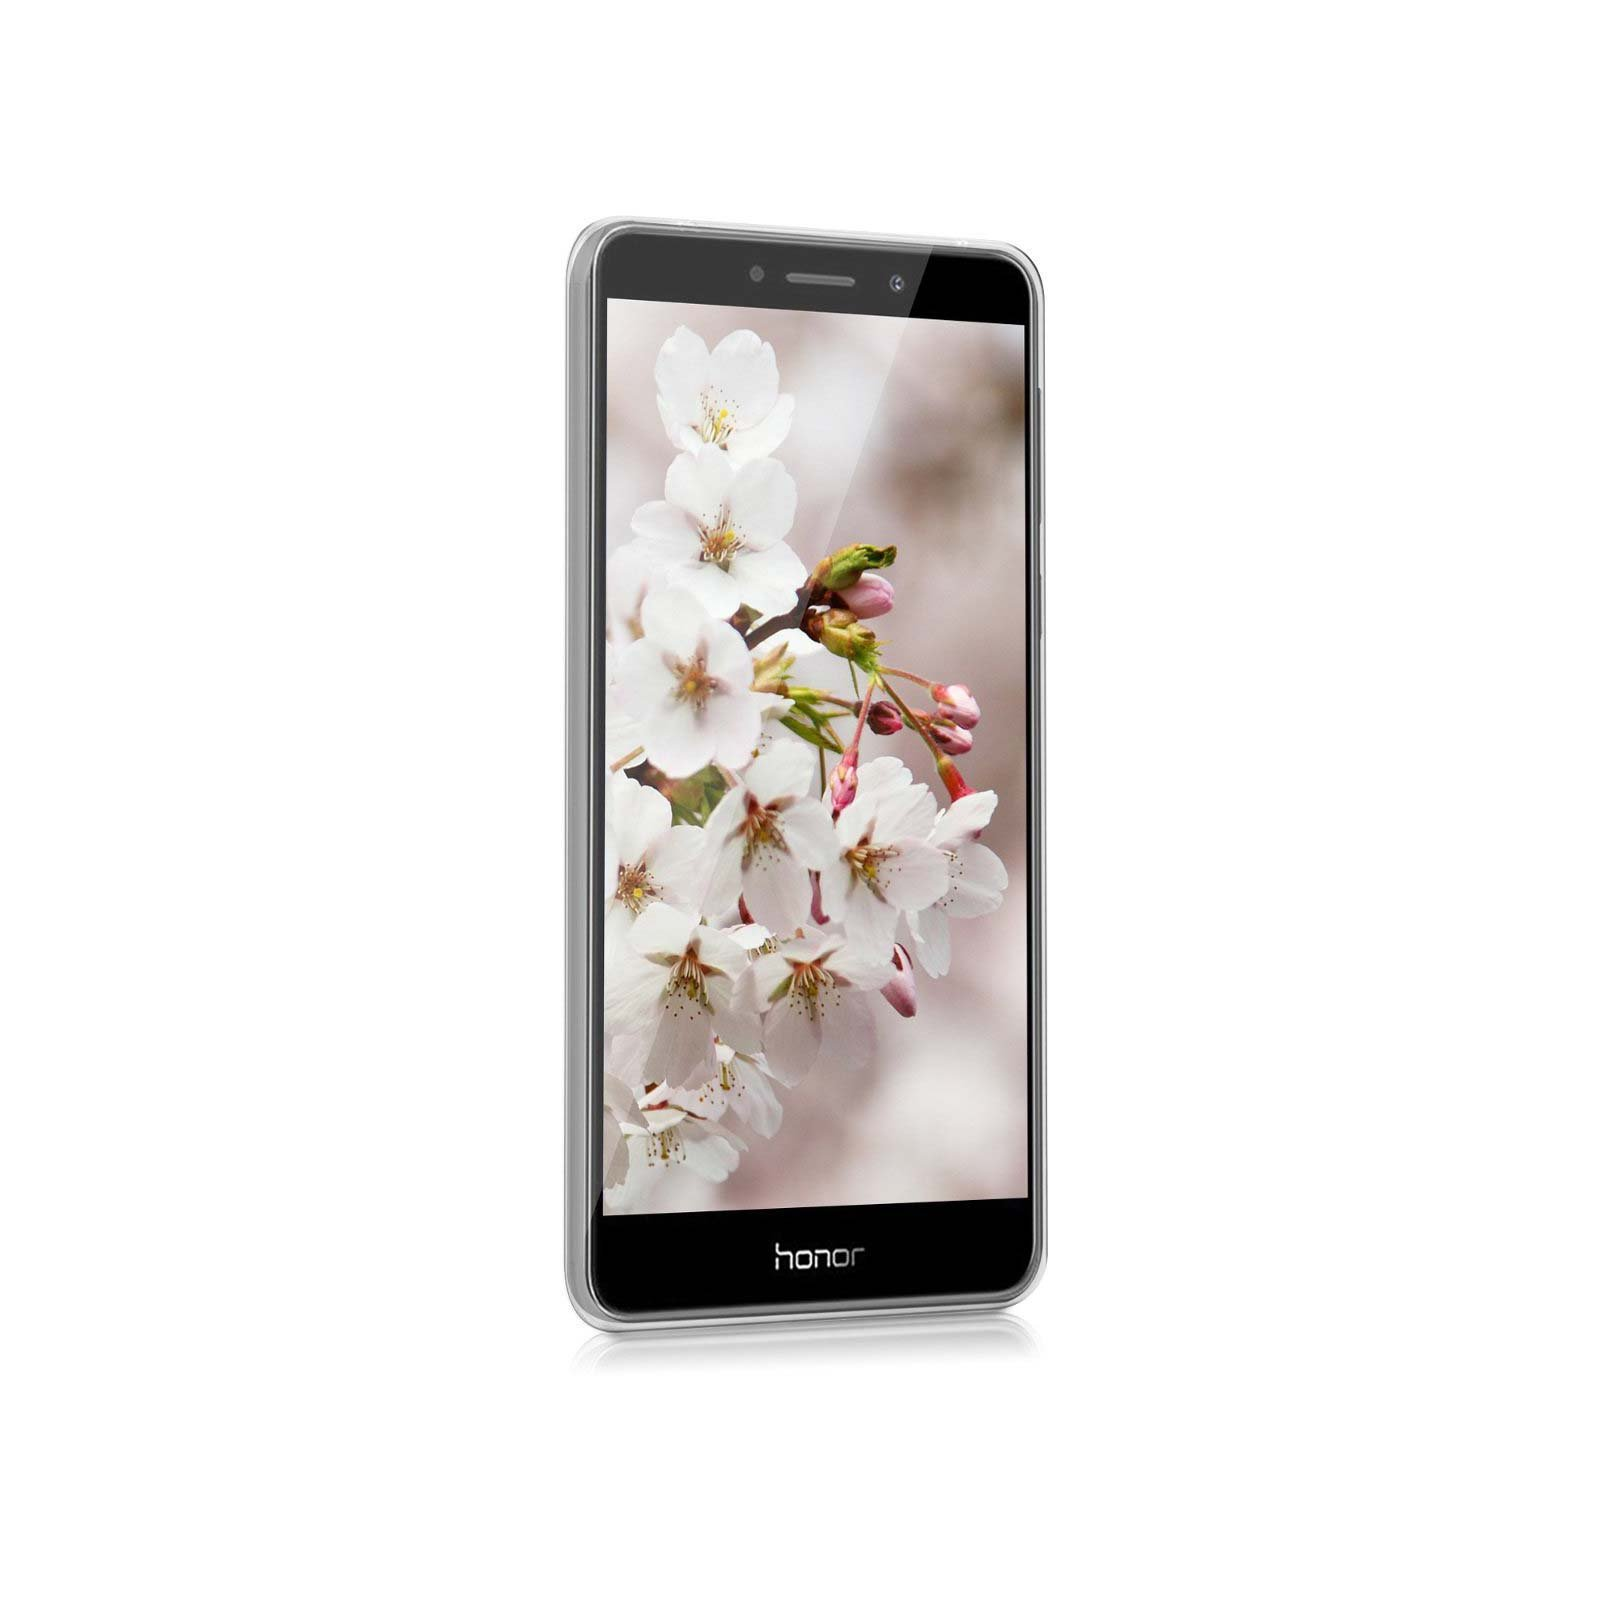 Coque Huawei Honor 6x, Ordica France®, Housse Honor 6X Transparente Silicone Gel Design Original Motif Catch Dream Accessoires Etui Protection